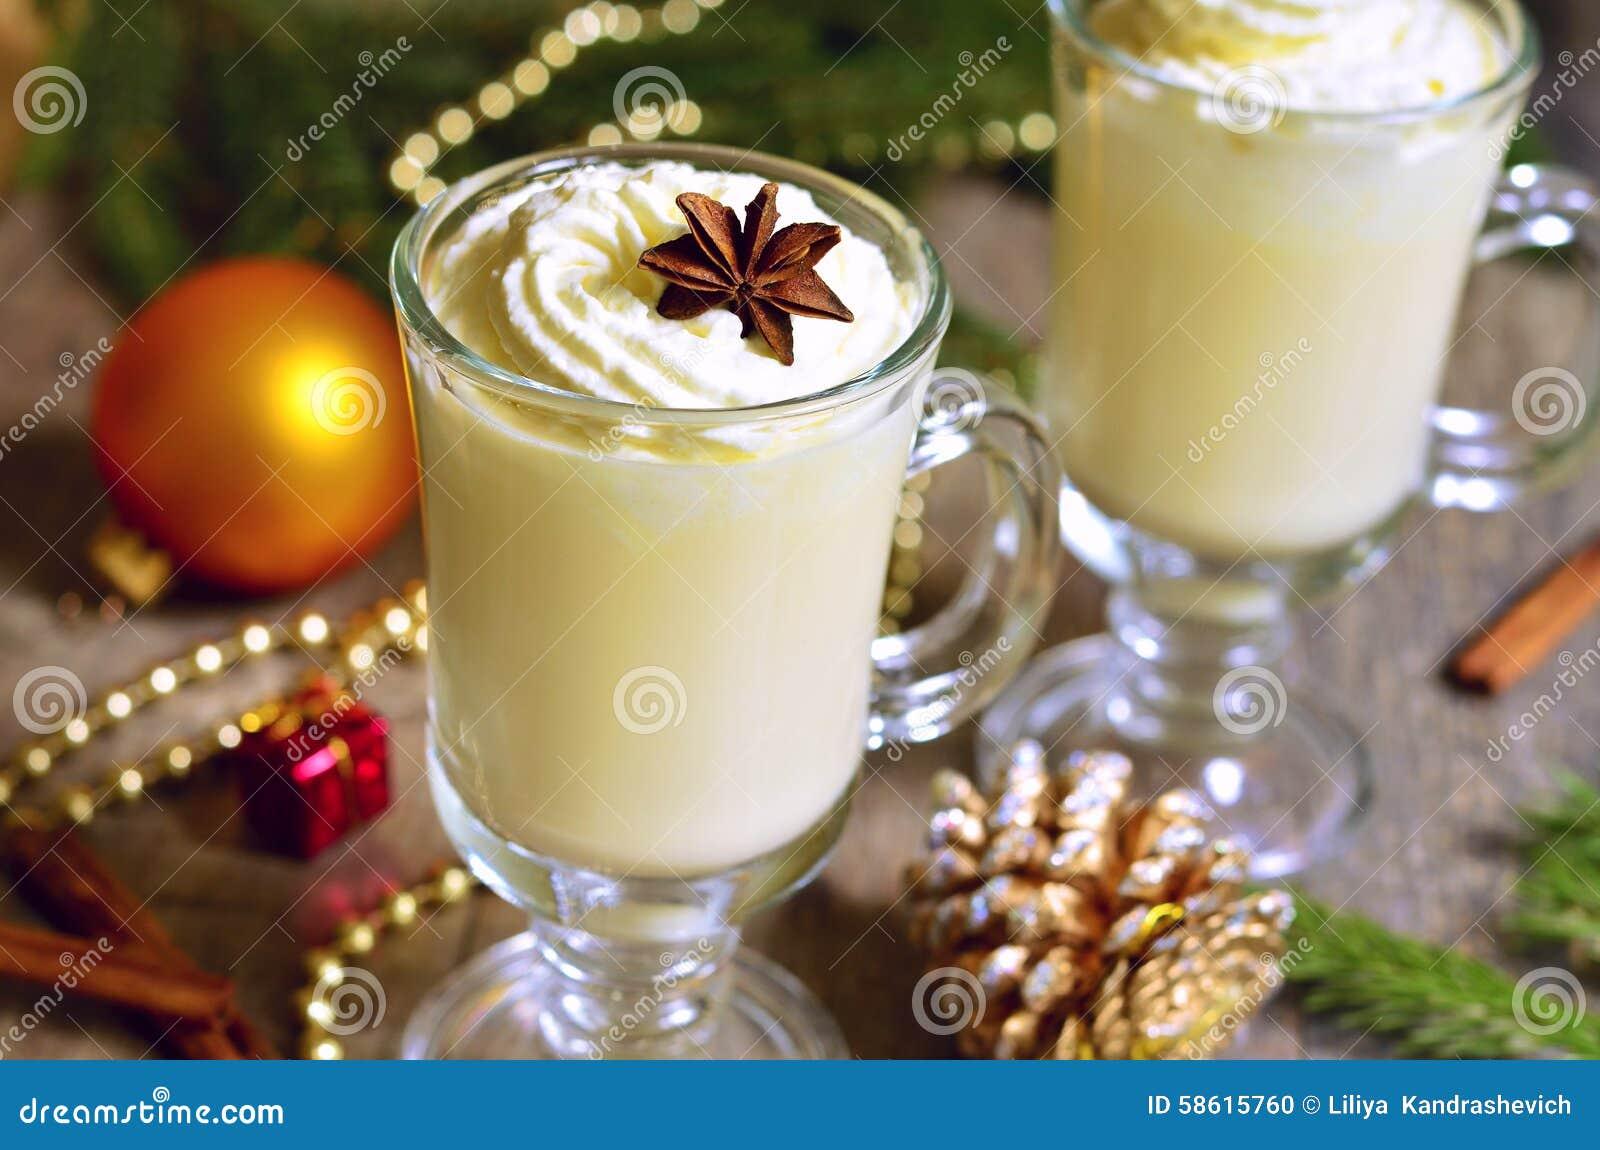 Eggnog - Hot Christmas Drink. Stock Photo - Image: 58615760